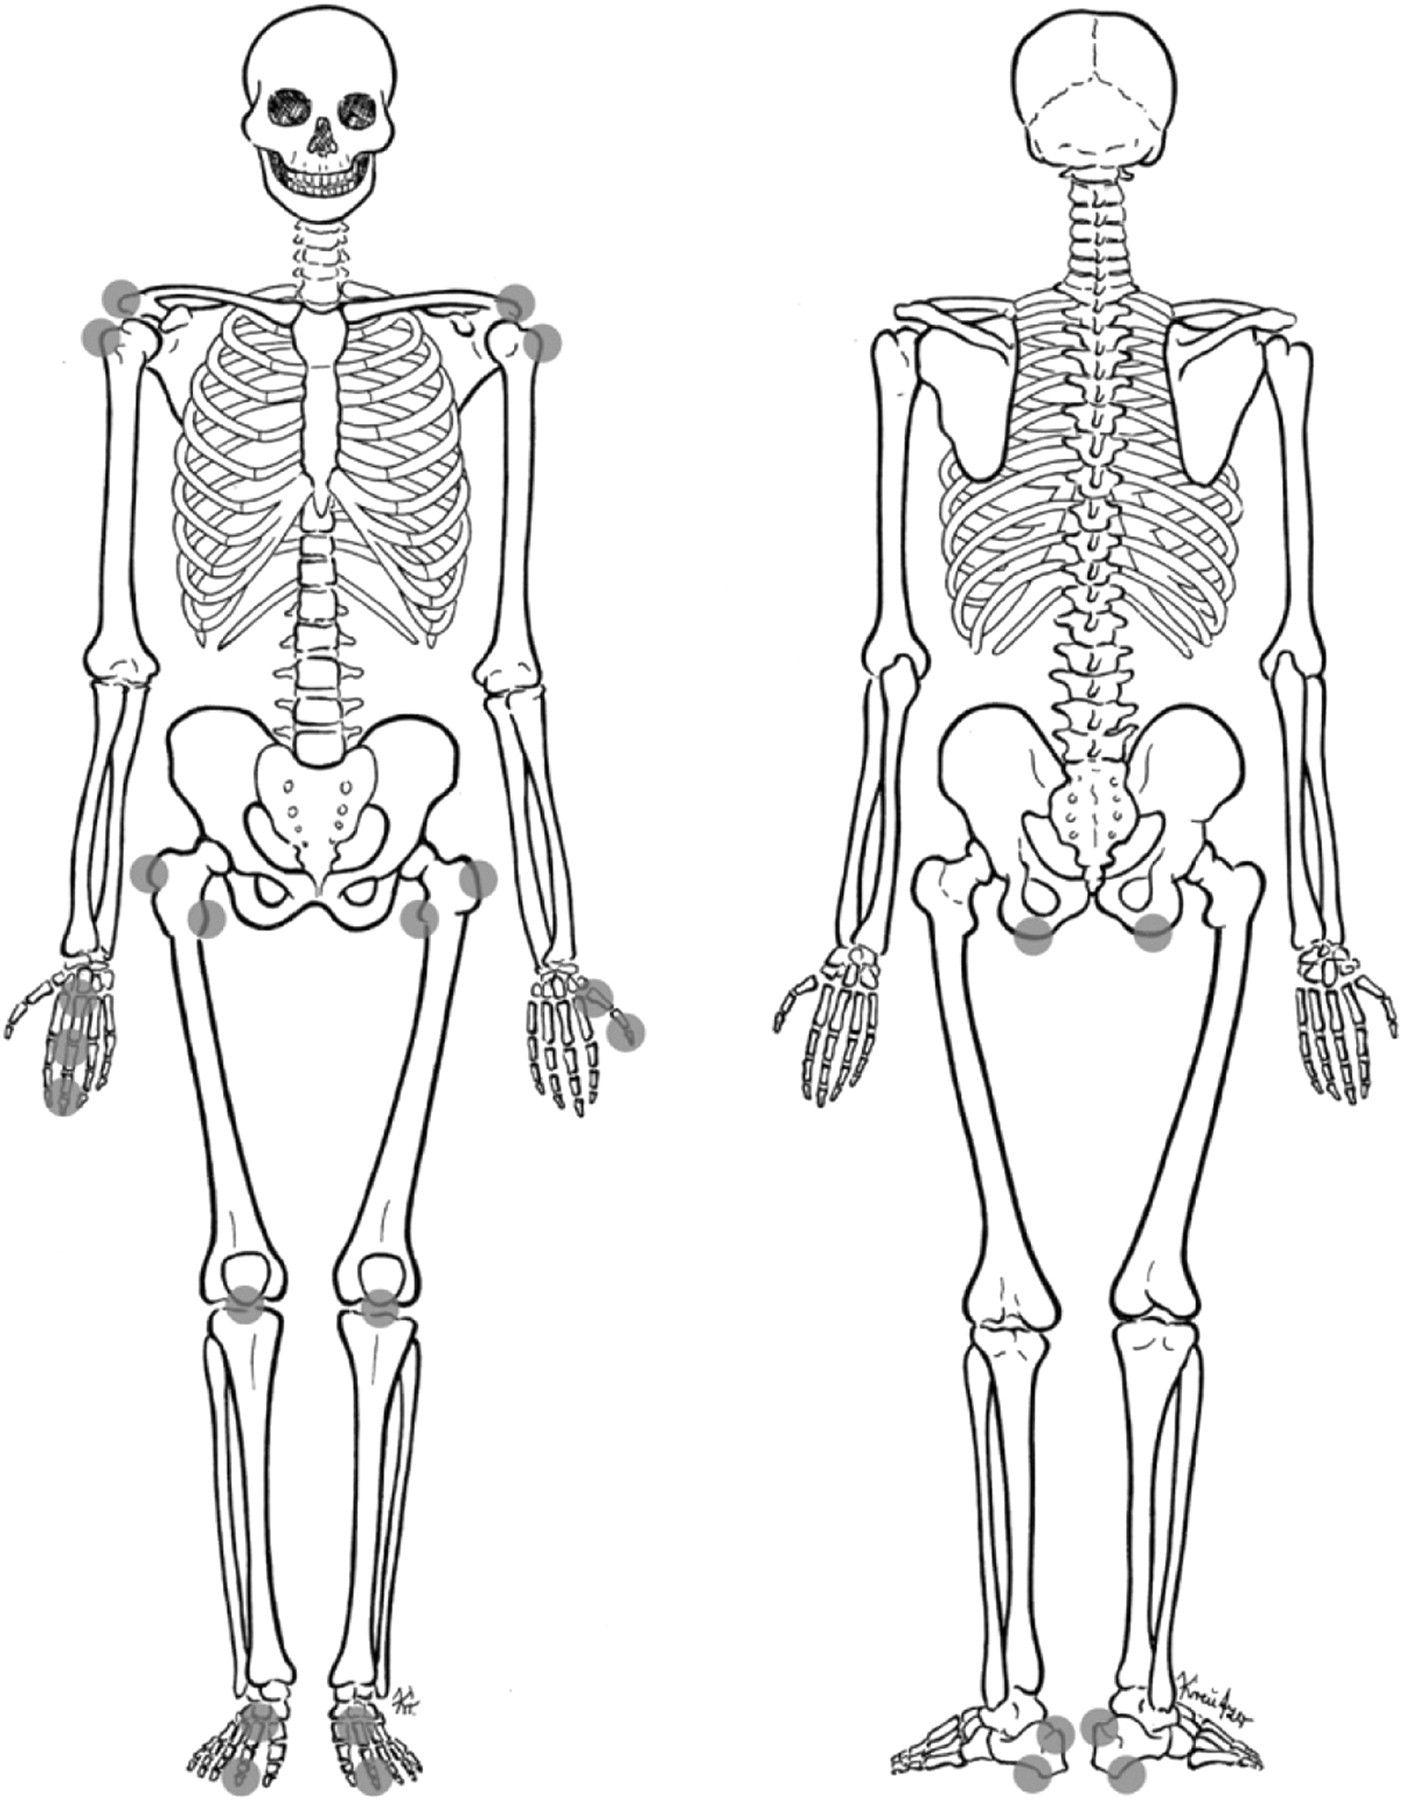 unlabeled human skeleton diagram unlabeled human skeleton diagram labeled diagram of skeletal system printable human [ 1405 x 1800 Pixel ]